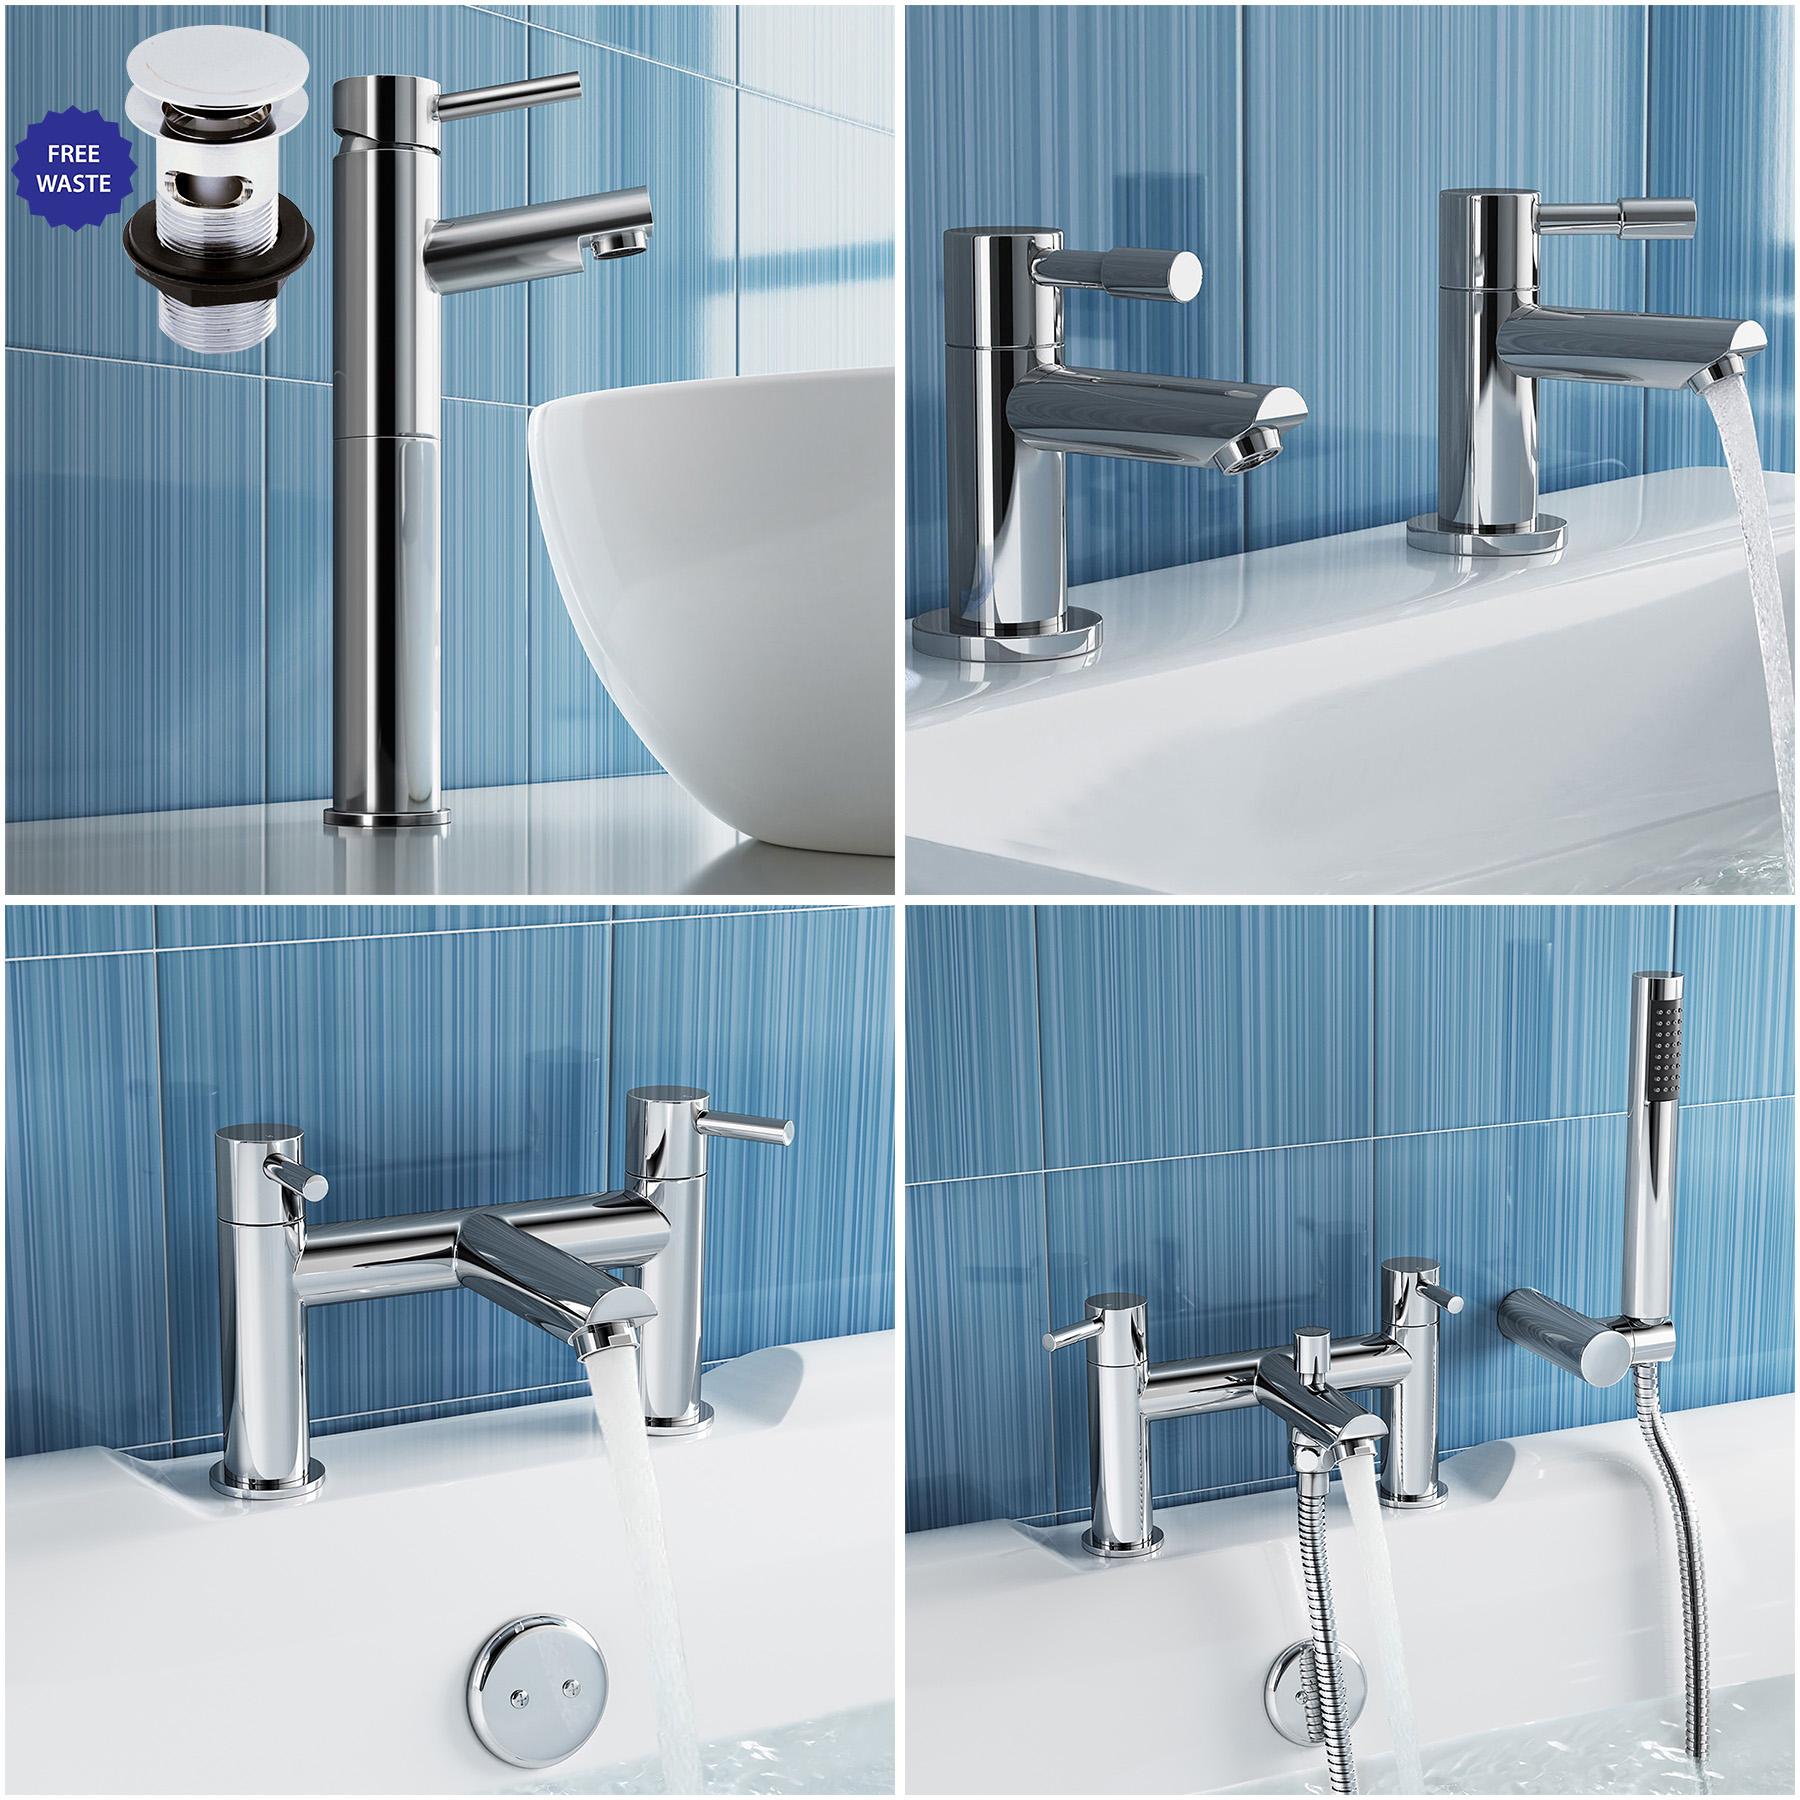 Bathroom Chrome Ultra Series 2 Bath Filler Basin Shower Mixer Taps ...